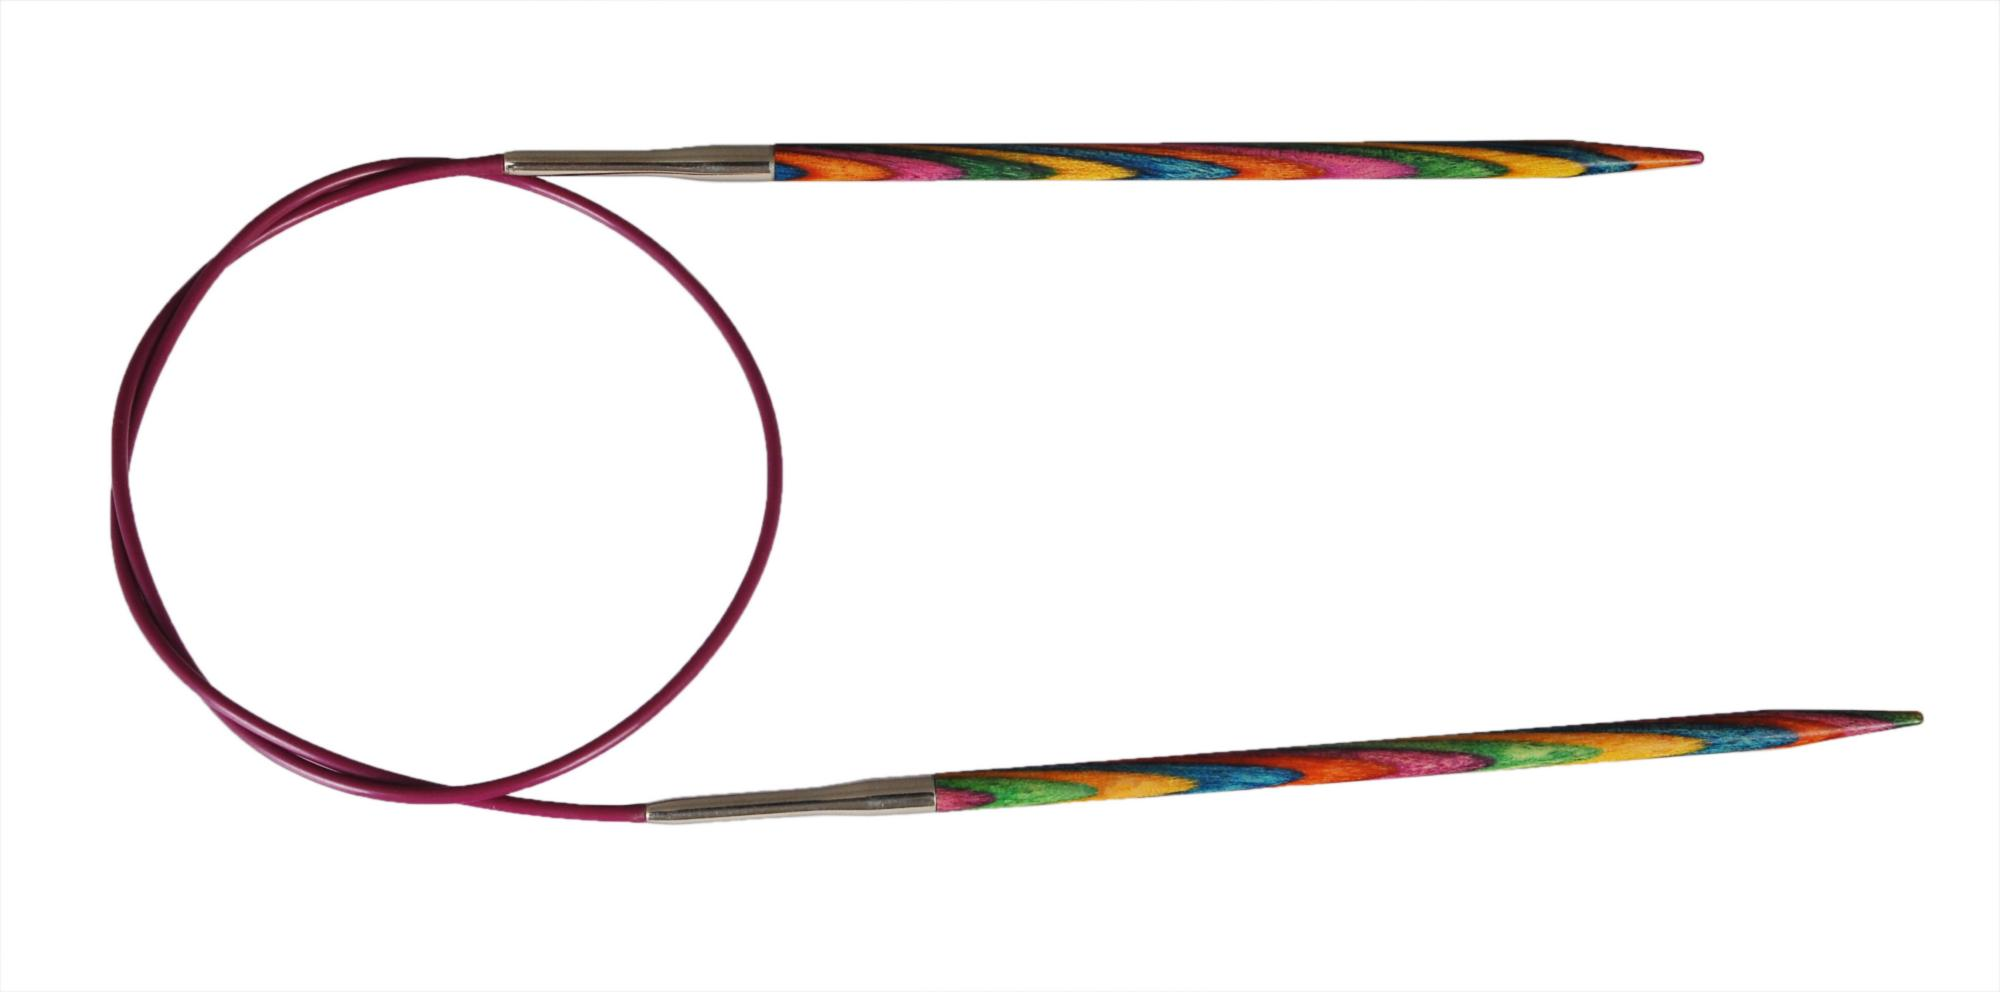 Спицы круговые 60 см Symfonie Wood KnitPro, 21323, 4.50 мм